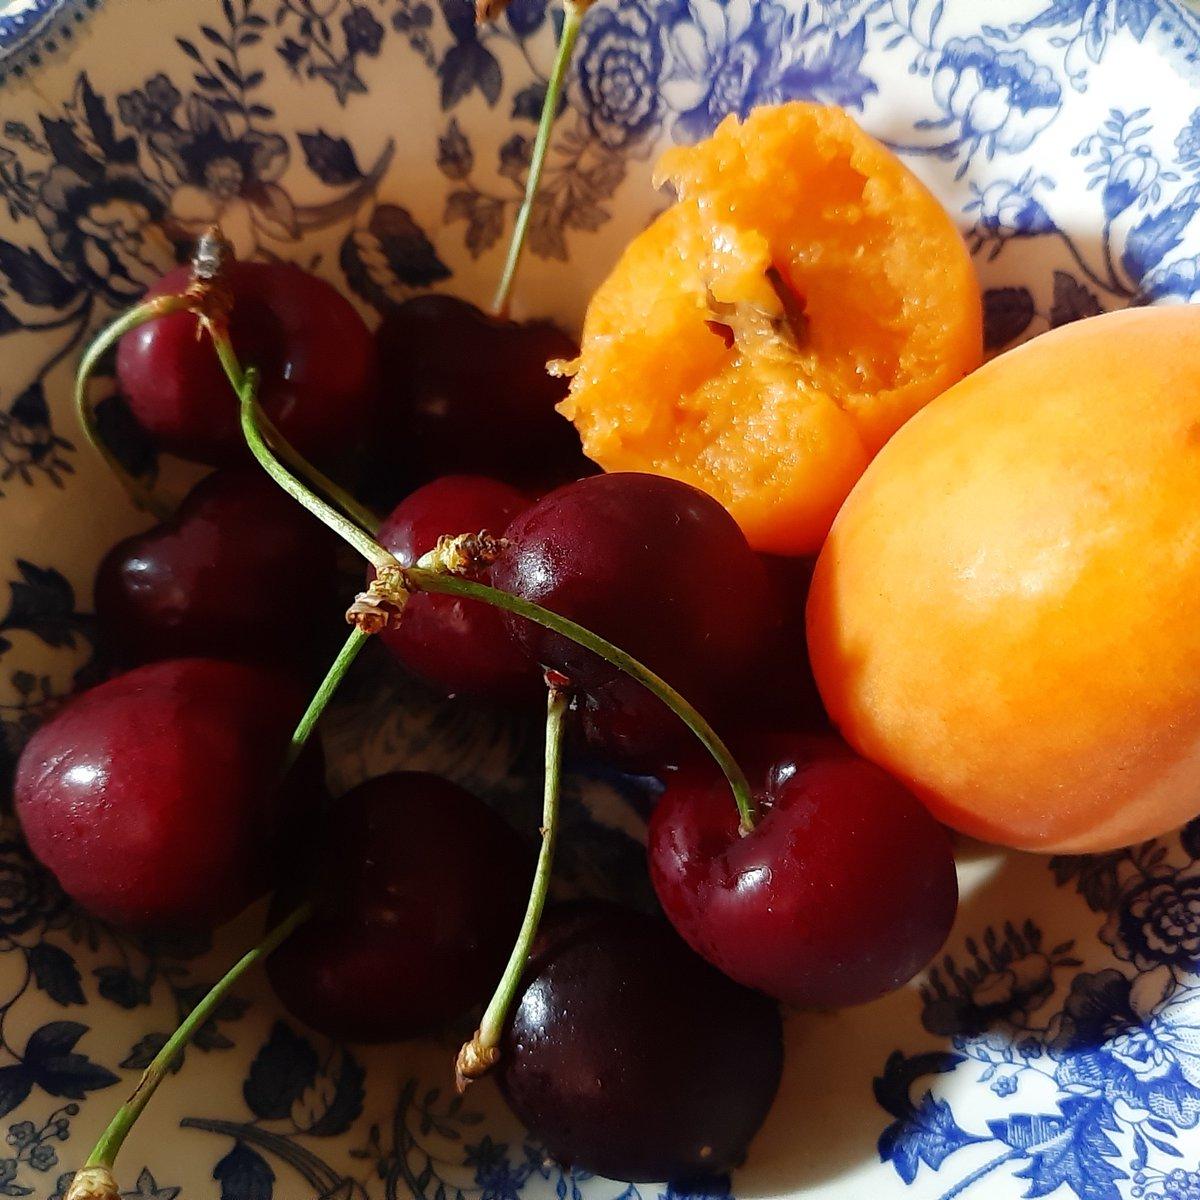 ......#frutta #fruttafrescapic.twitter.com/RNU4nlBQpd